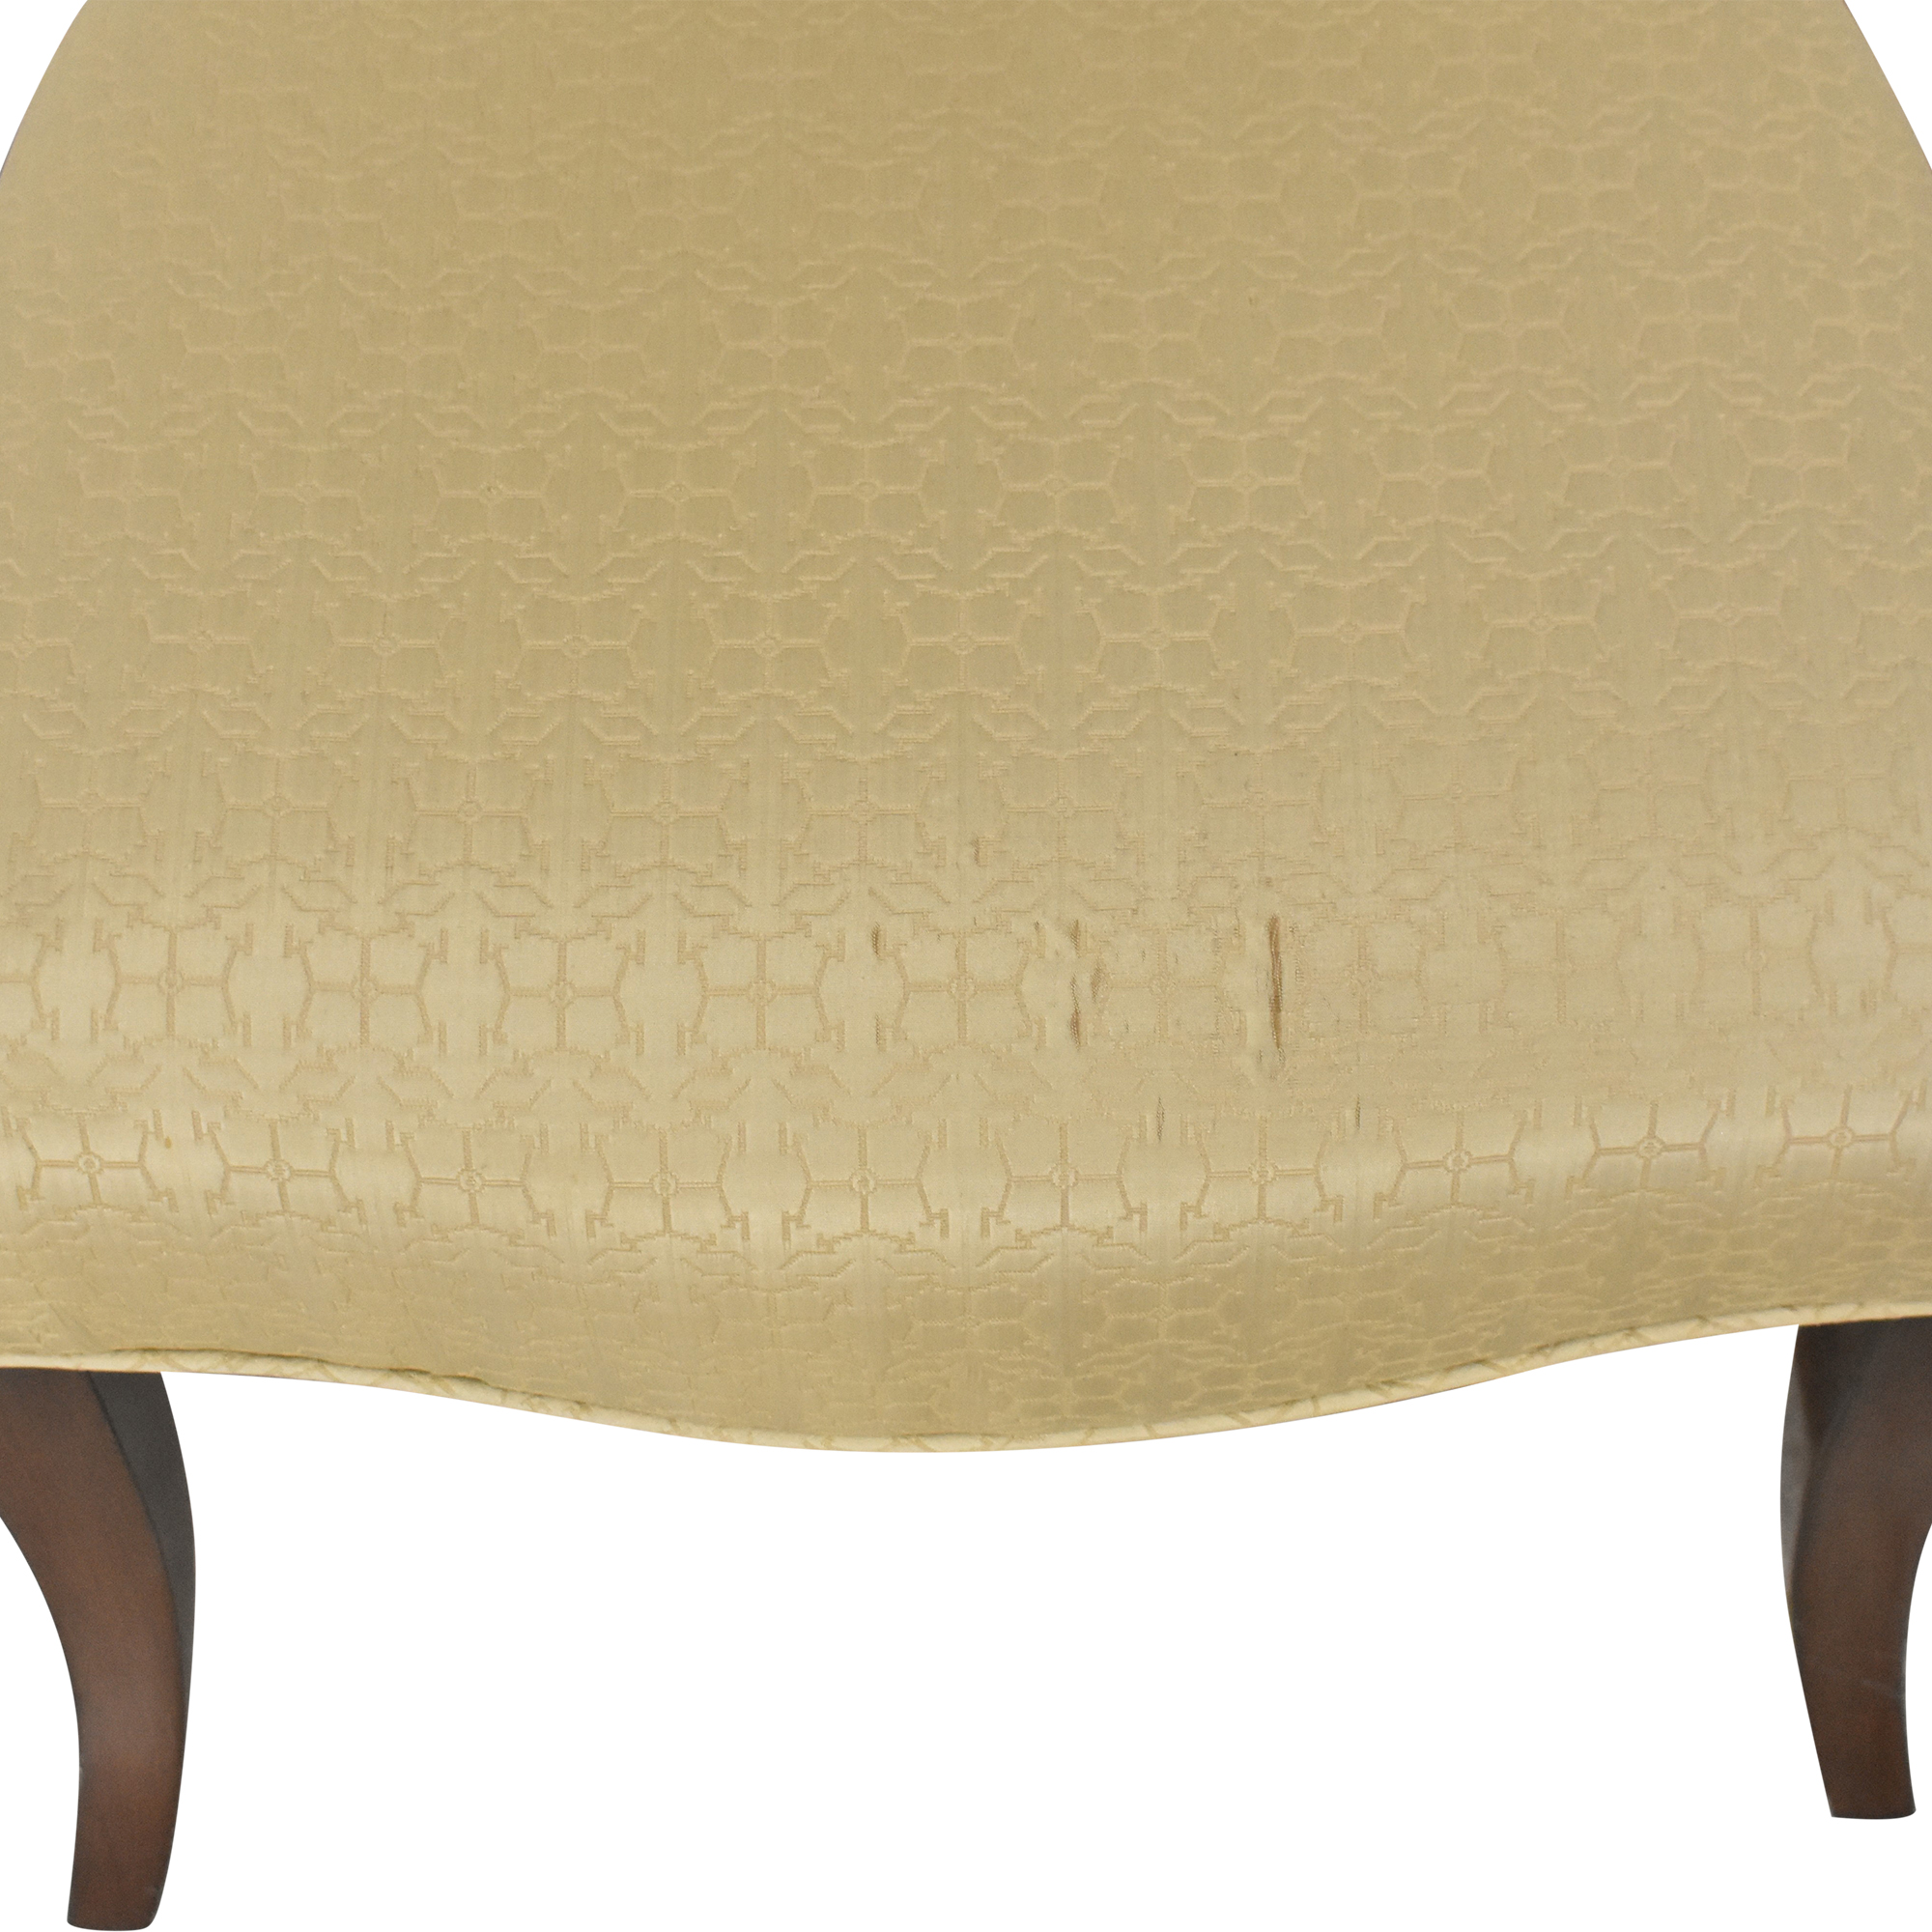 Ferrell Mittman Custom Wing Dining Chairs / Chairs